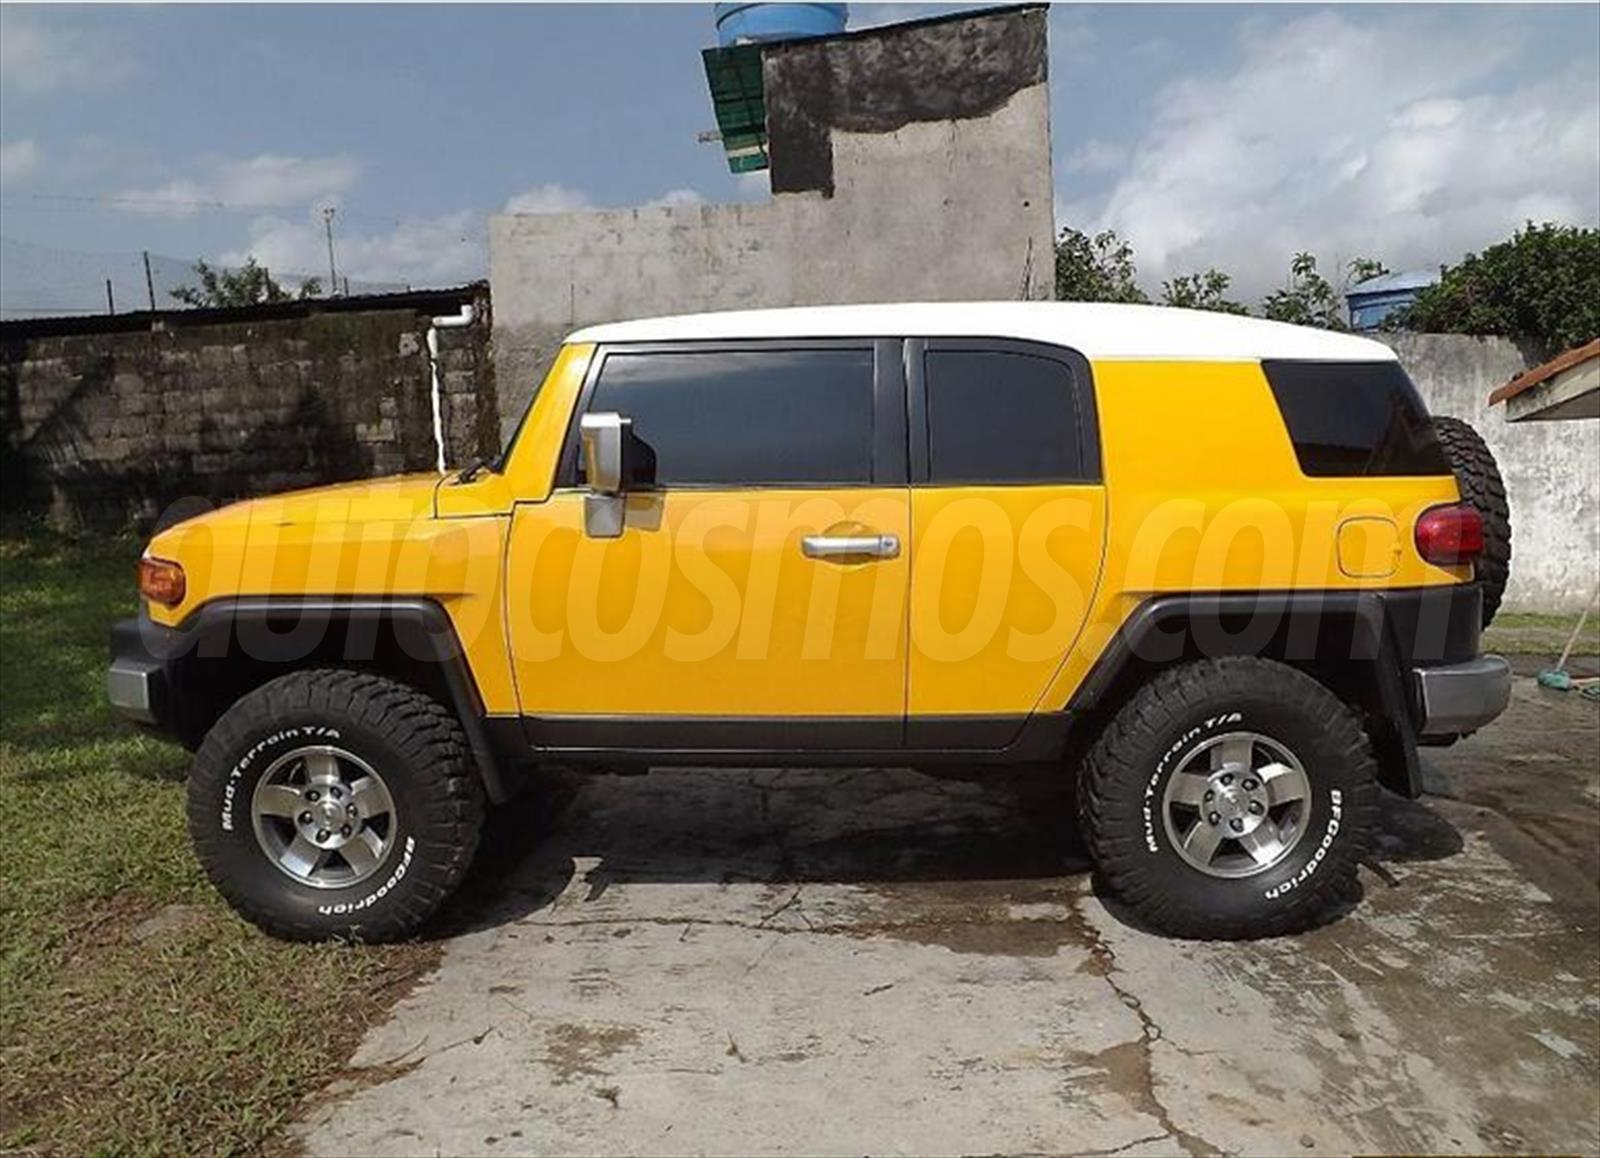 Venta carros usado - Distrito Capital - Toyota Land